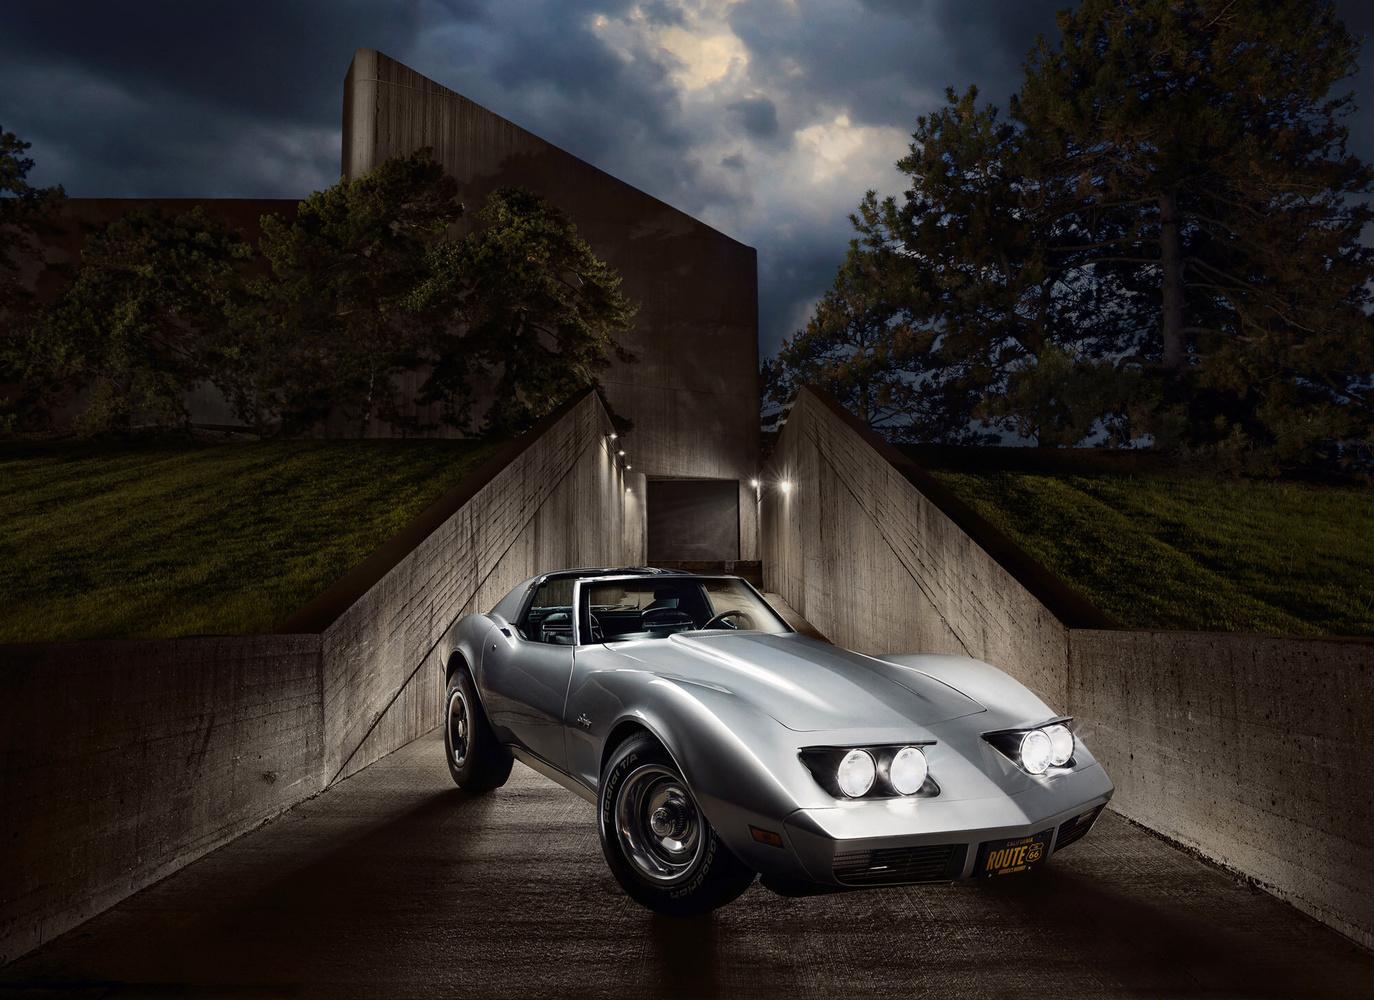 1974 Corvette Stingray by Dan McClanahan